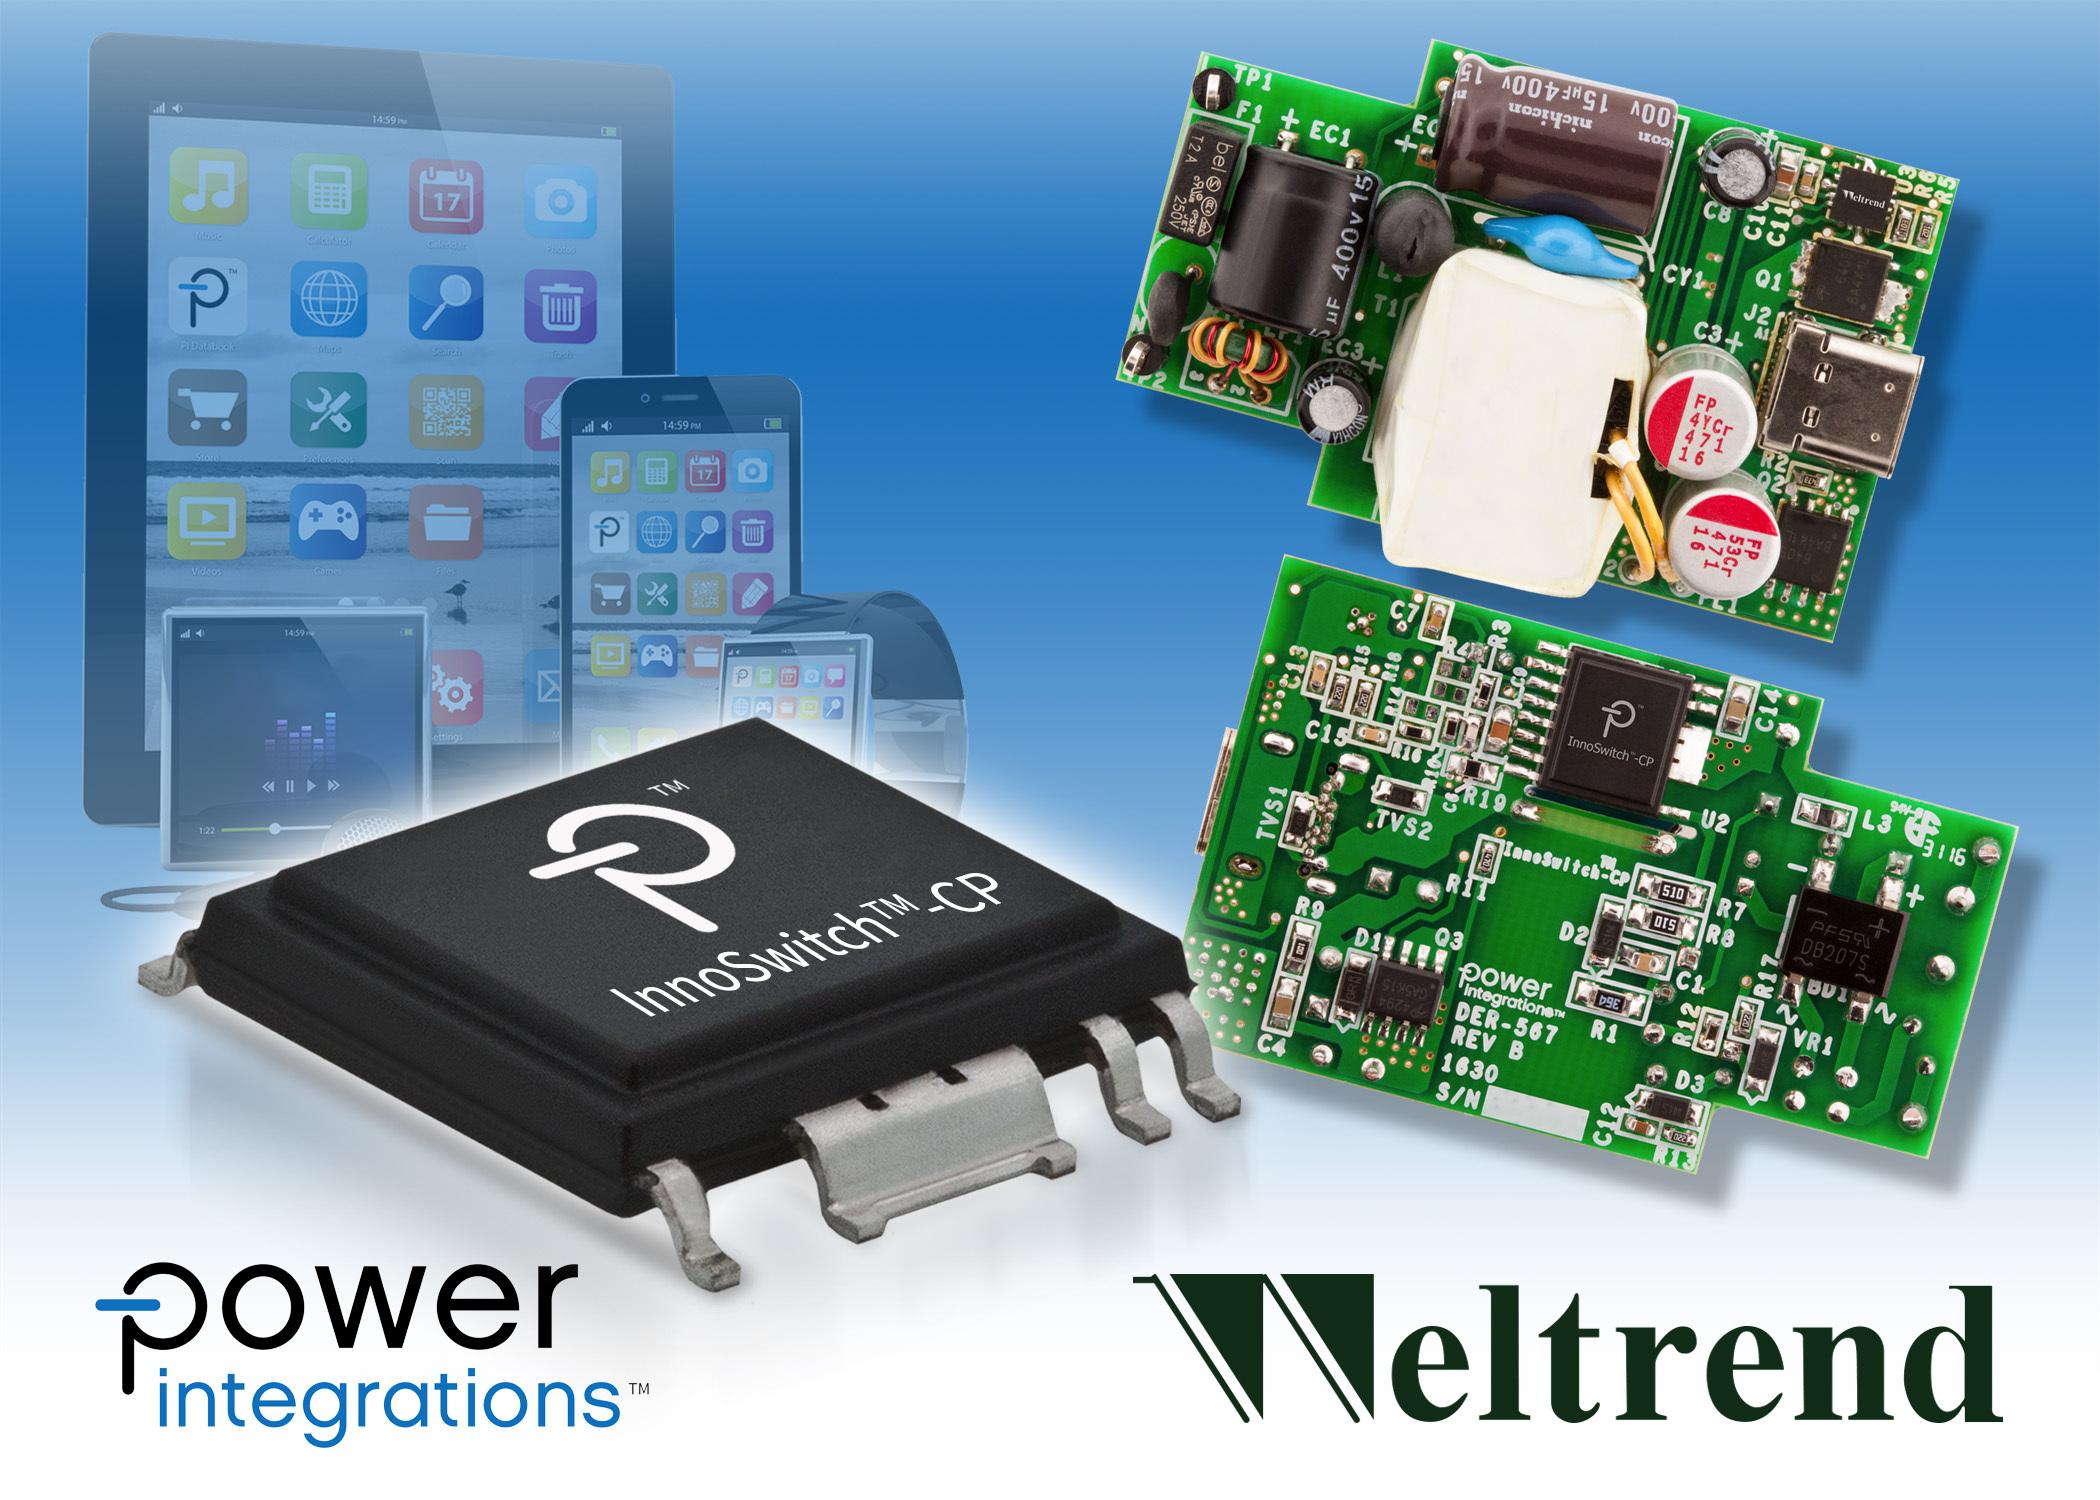 Power Integrations 和 偉詮電子宣布推出智慧型行動裝置適用的 18 W USB PD 快速充電器參考設計 (照片:美國商業資訊)